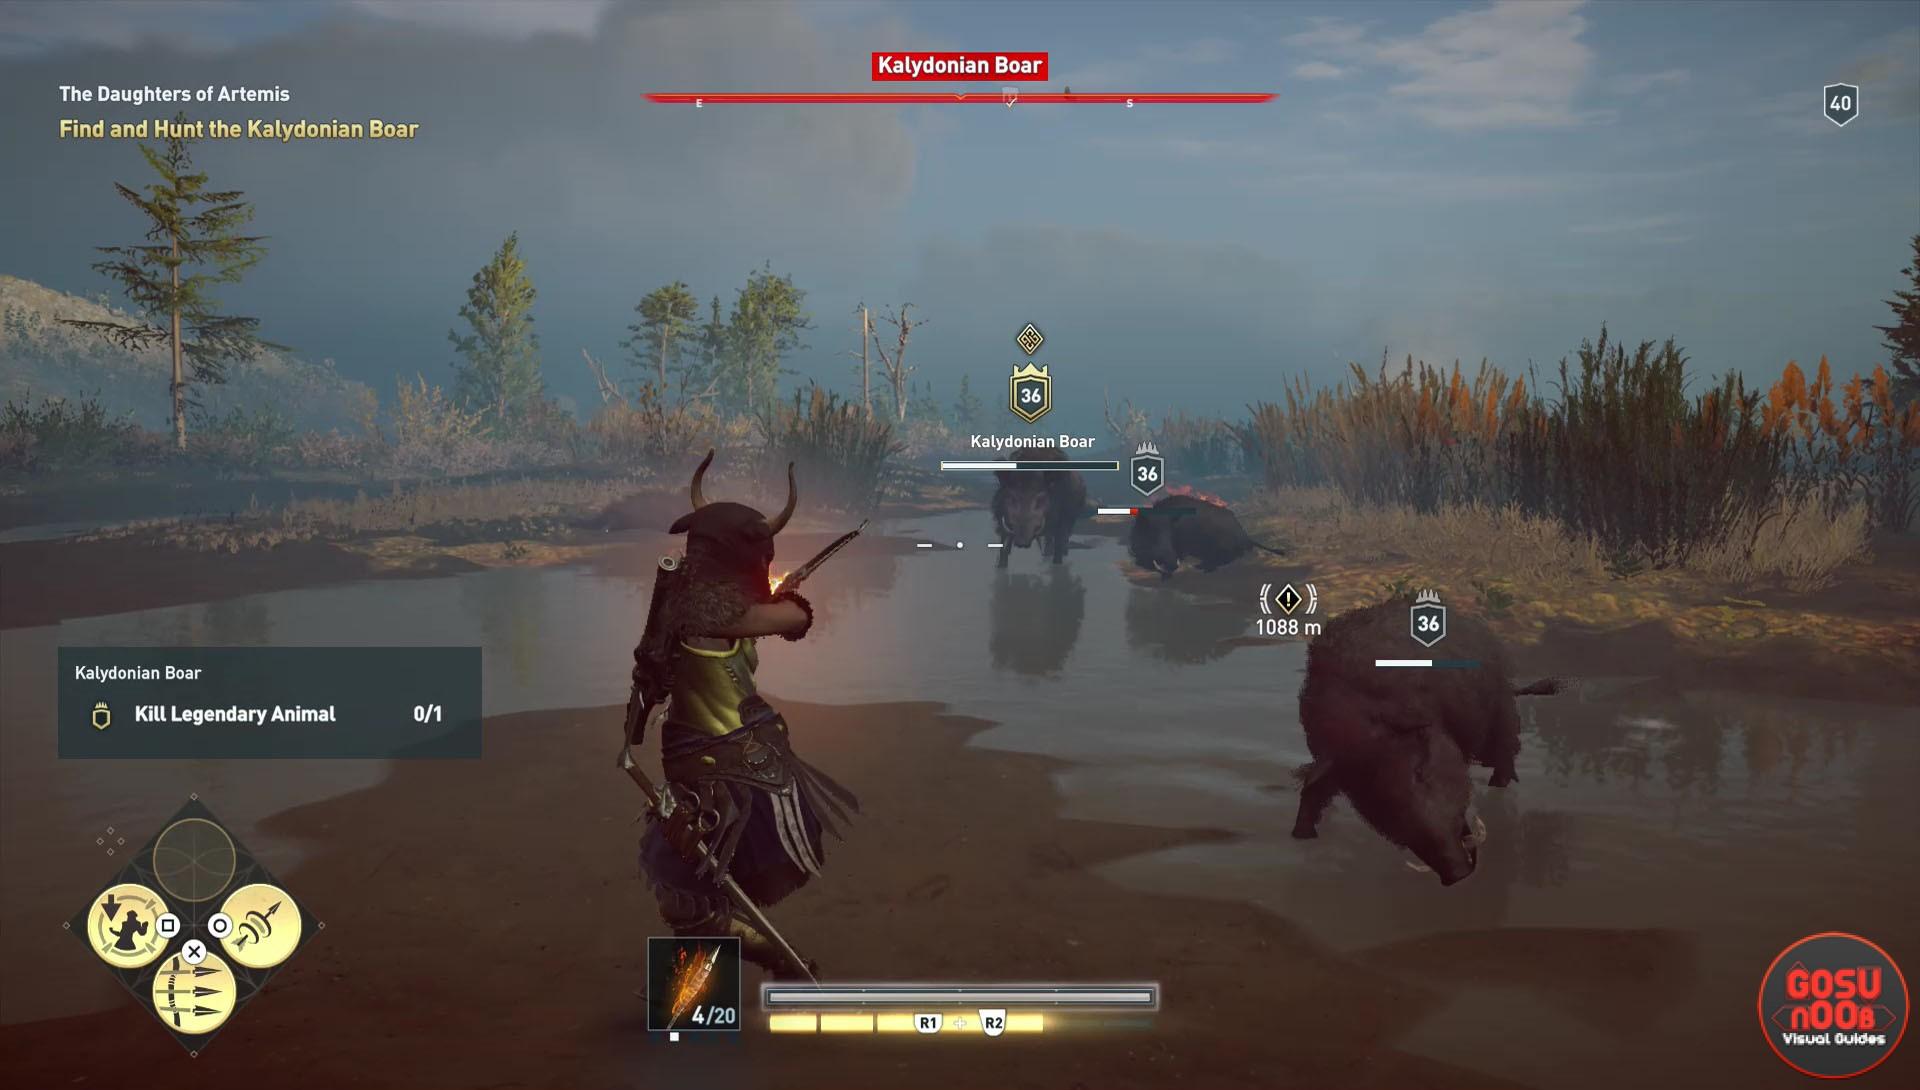 Assassin S Creed Odyssey Legendary Boar How To Kill Kalydonian